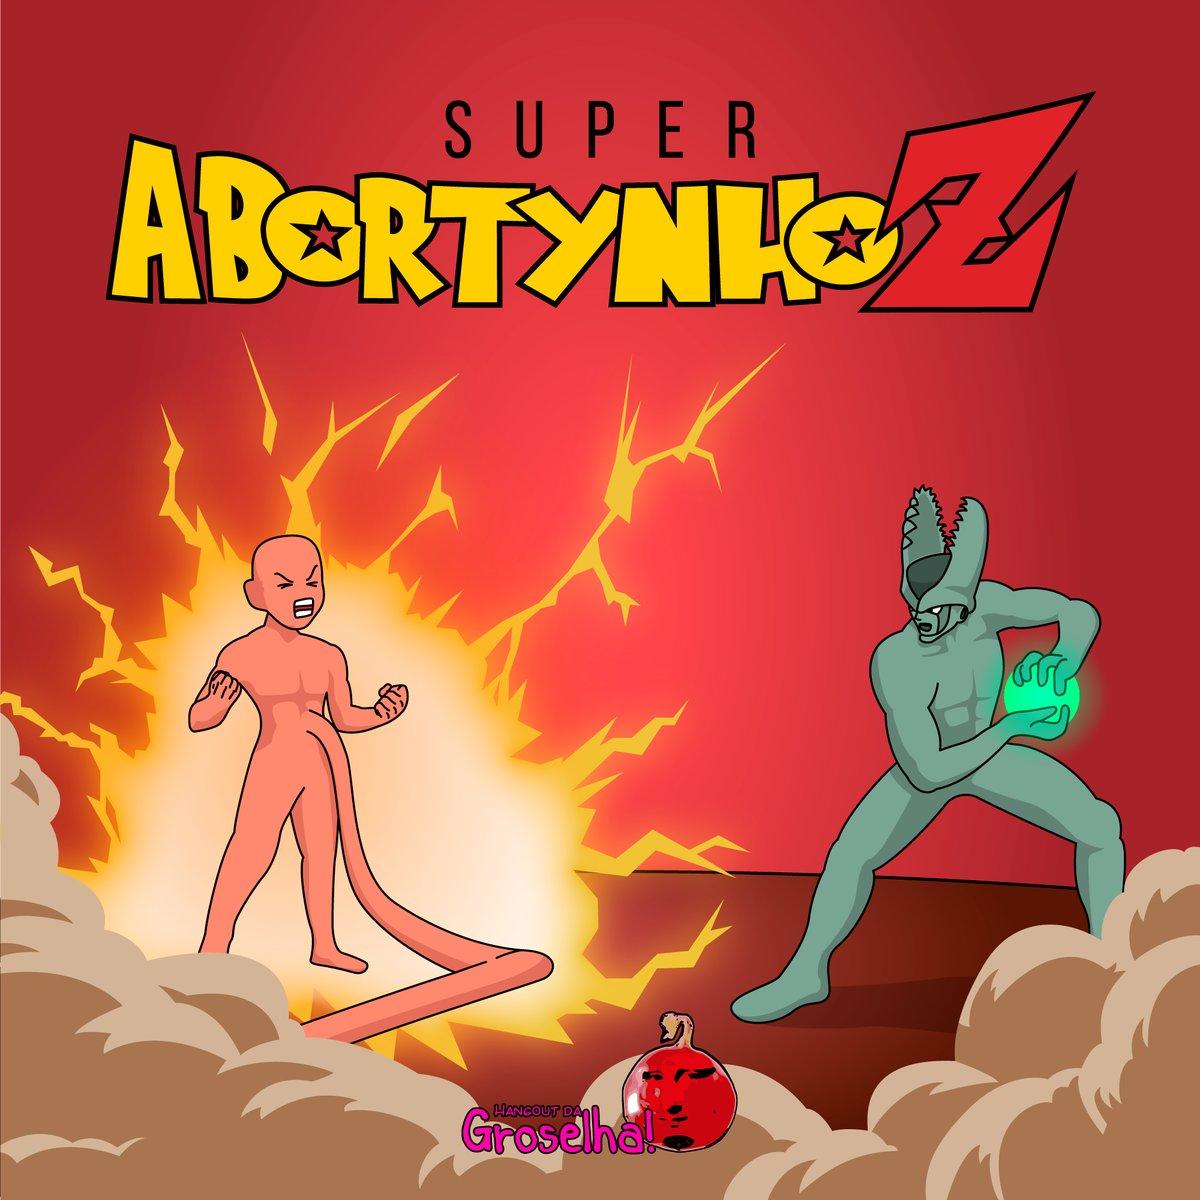 Super Abortinho Z